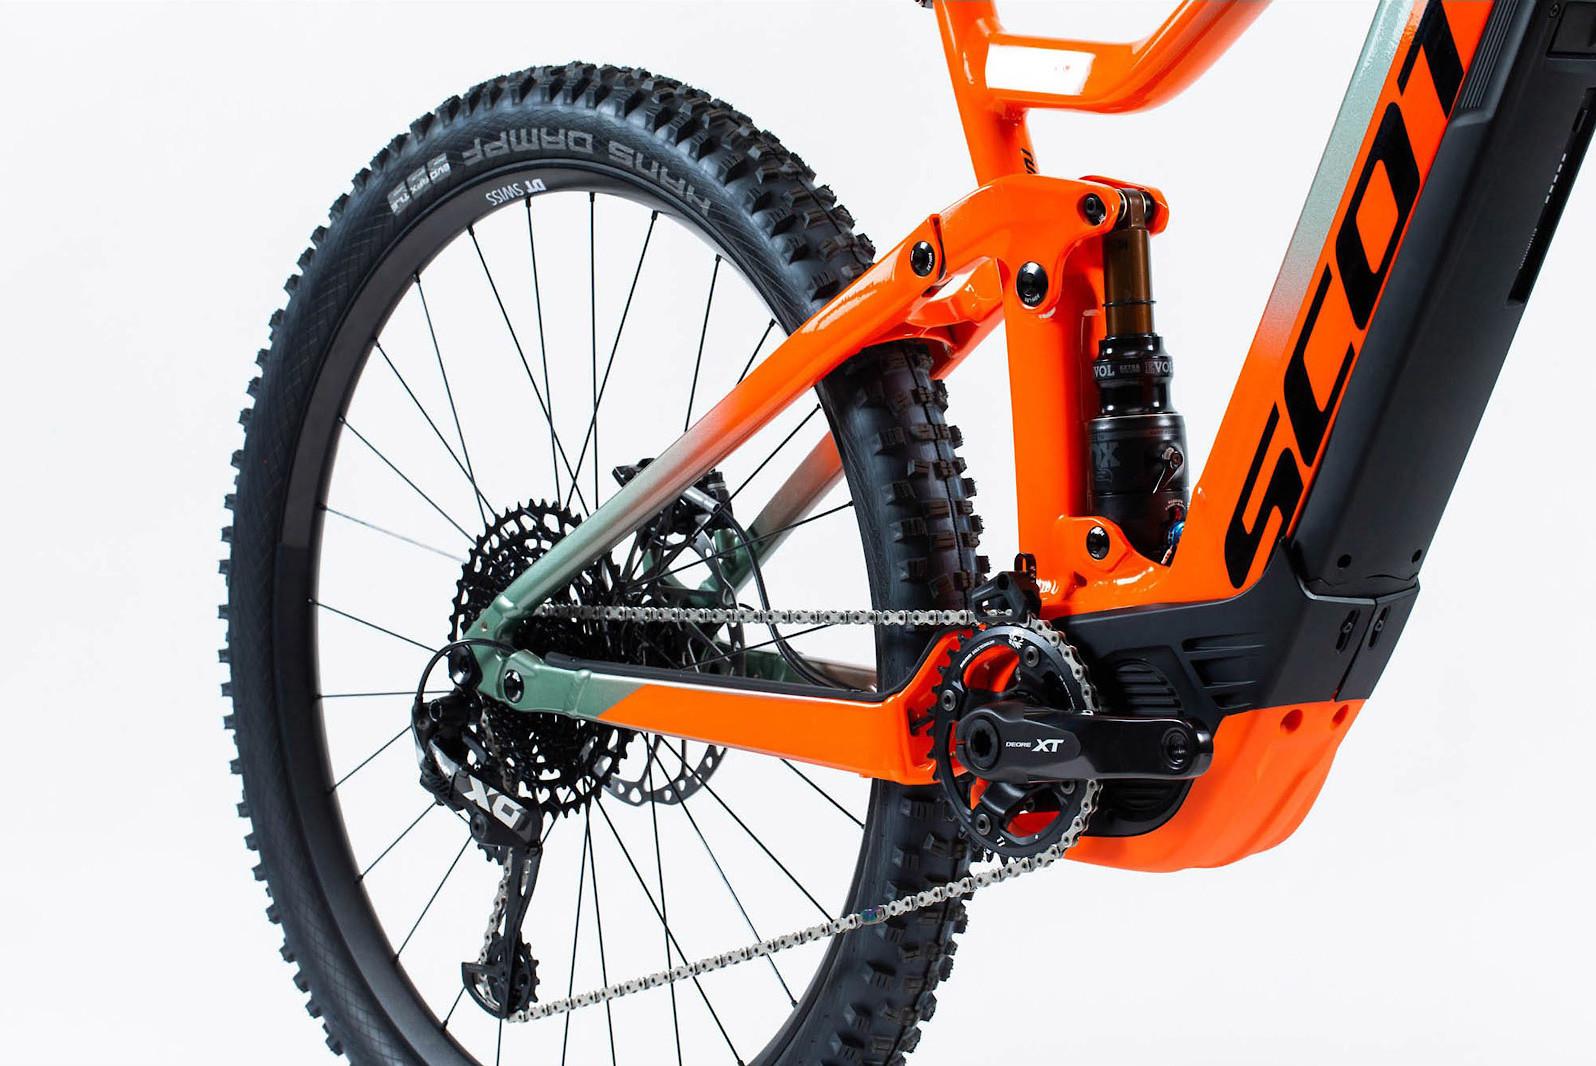 2019 Scott Genius eRide 900 Tuned E-Bike - Reviews, Comparisons